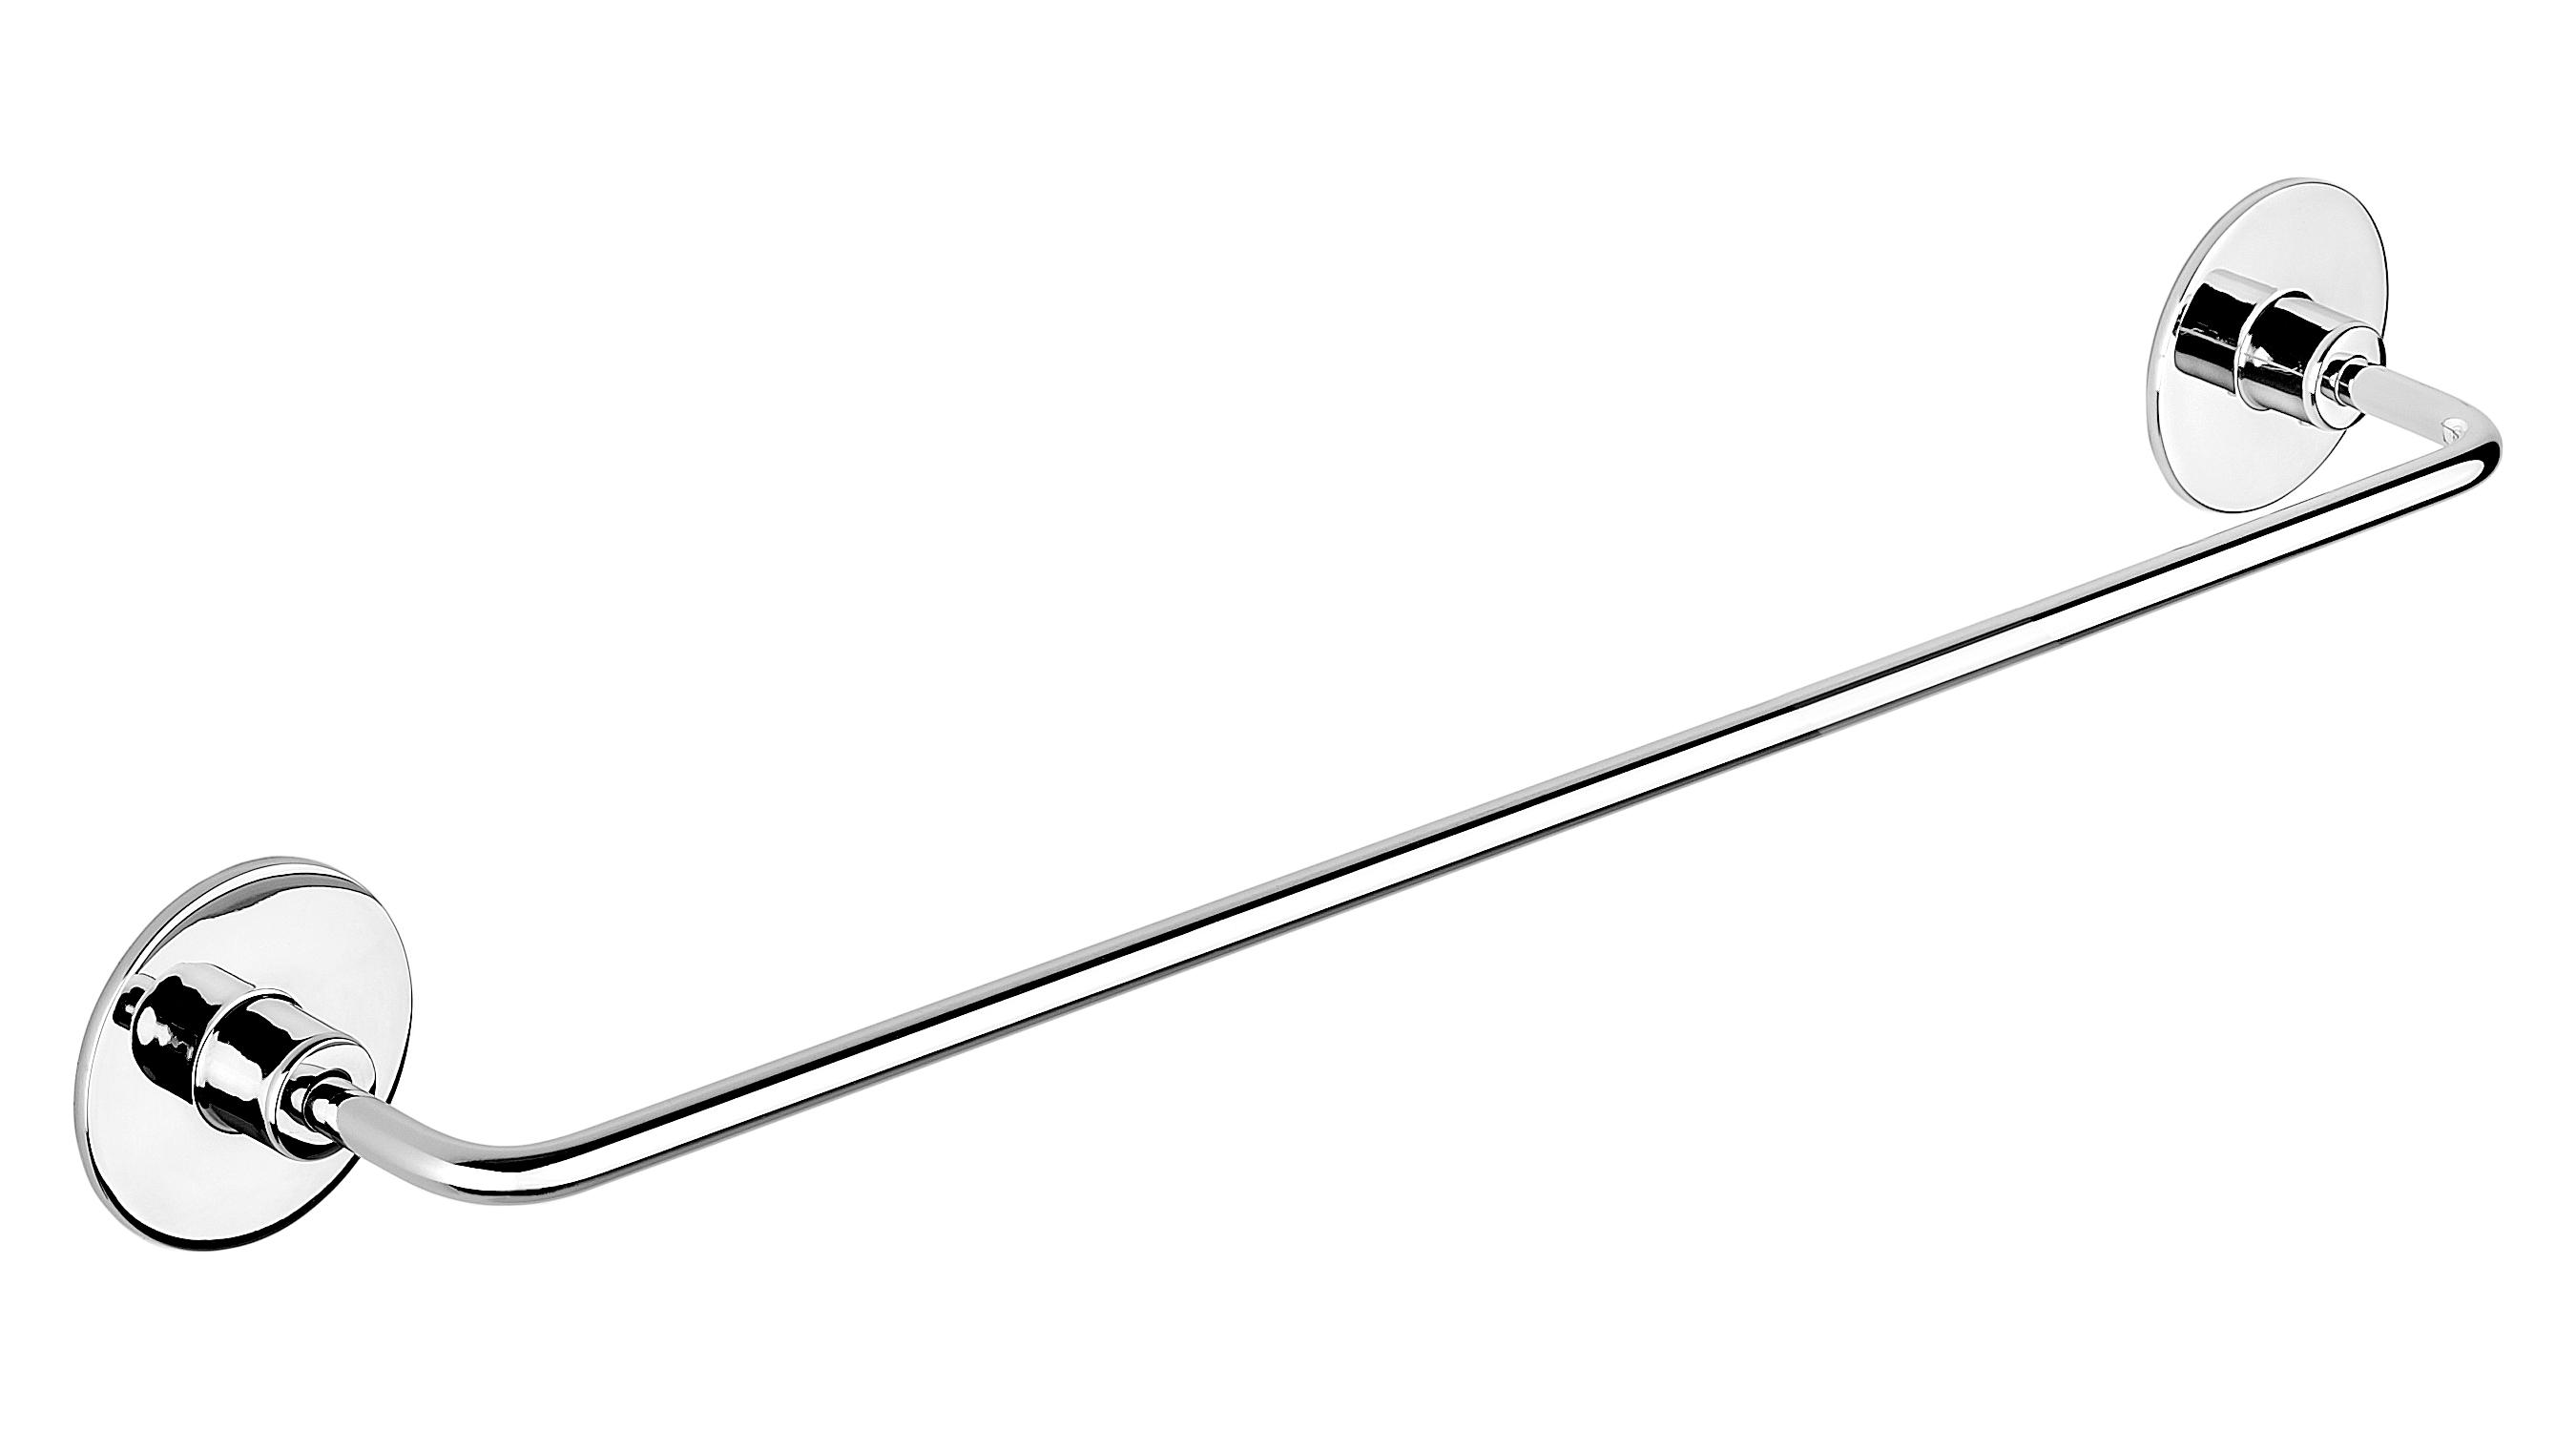 Suport prosop cu montare fara gauri 40 cm CasaBlanca WIND C63 imagine